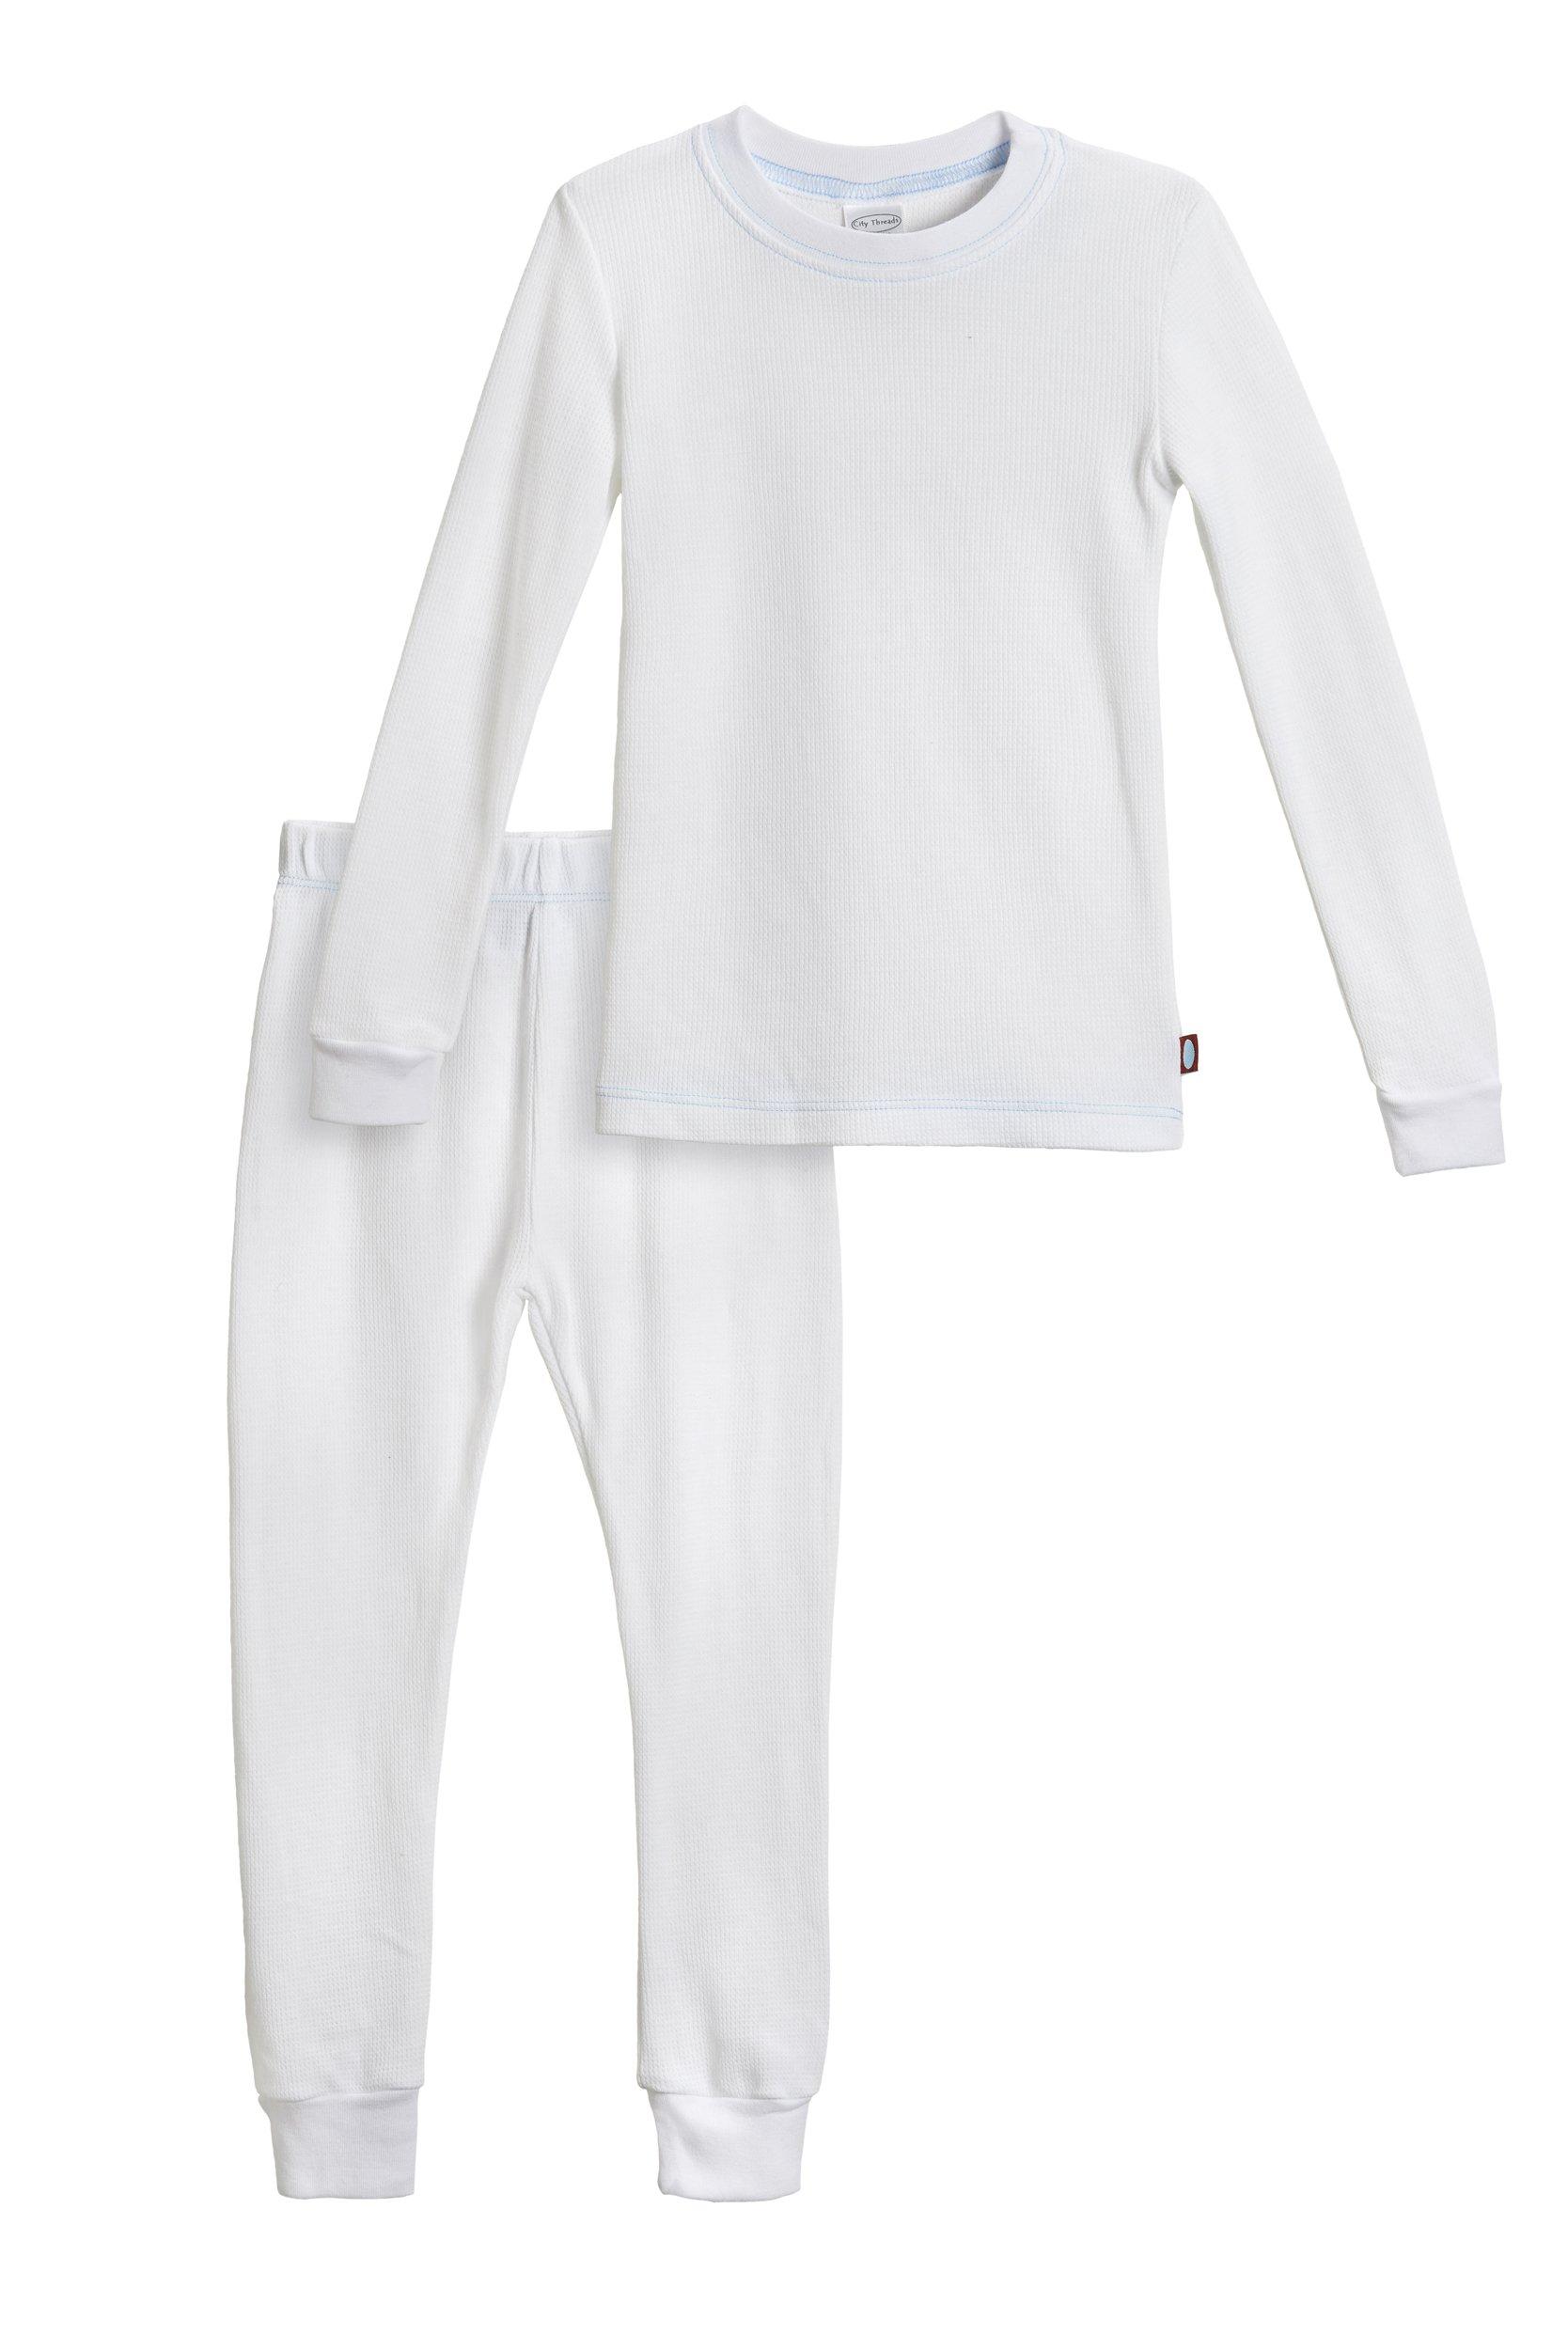 City Threads Little Boys Thermal Underwear Set Perfect for Sensitive Skin SPD Sensory Friendly, White- 4T